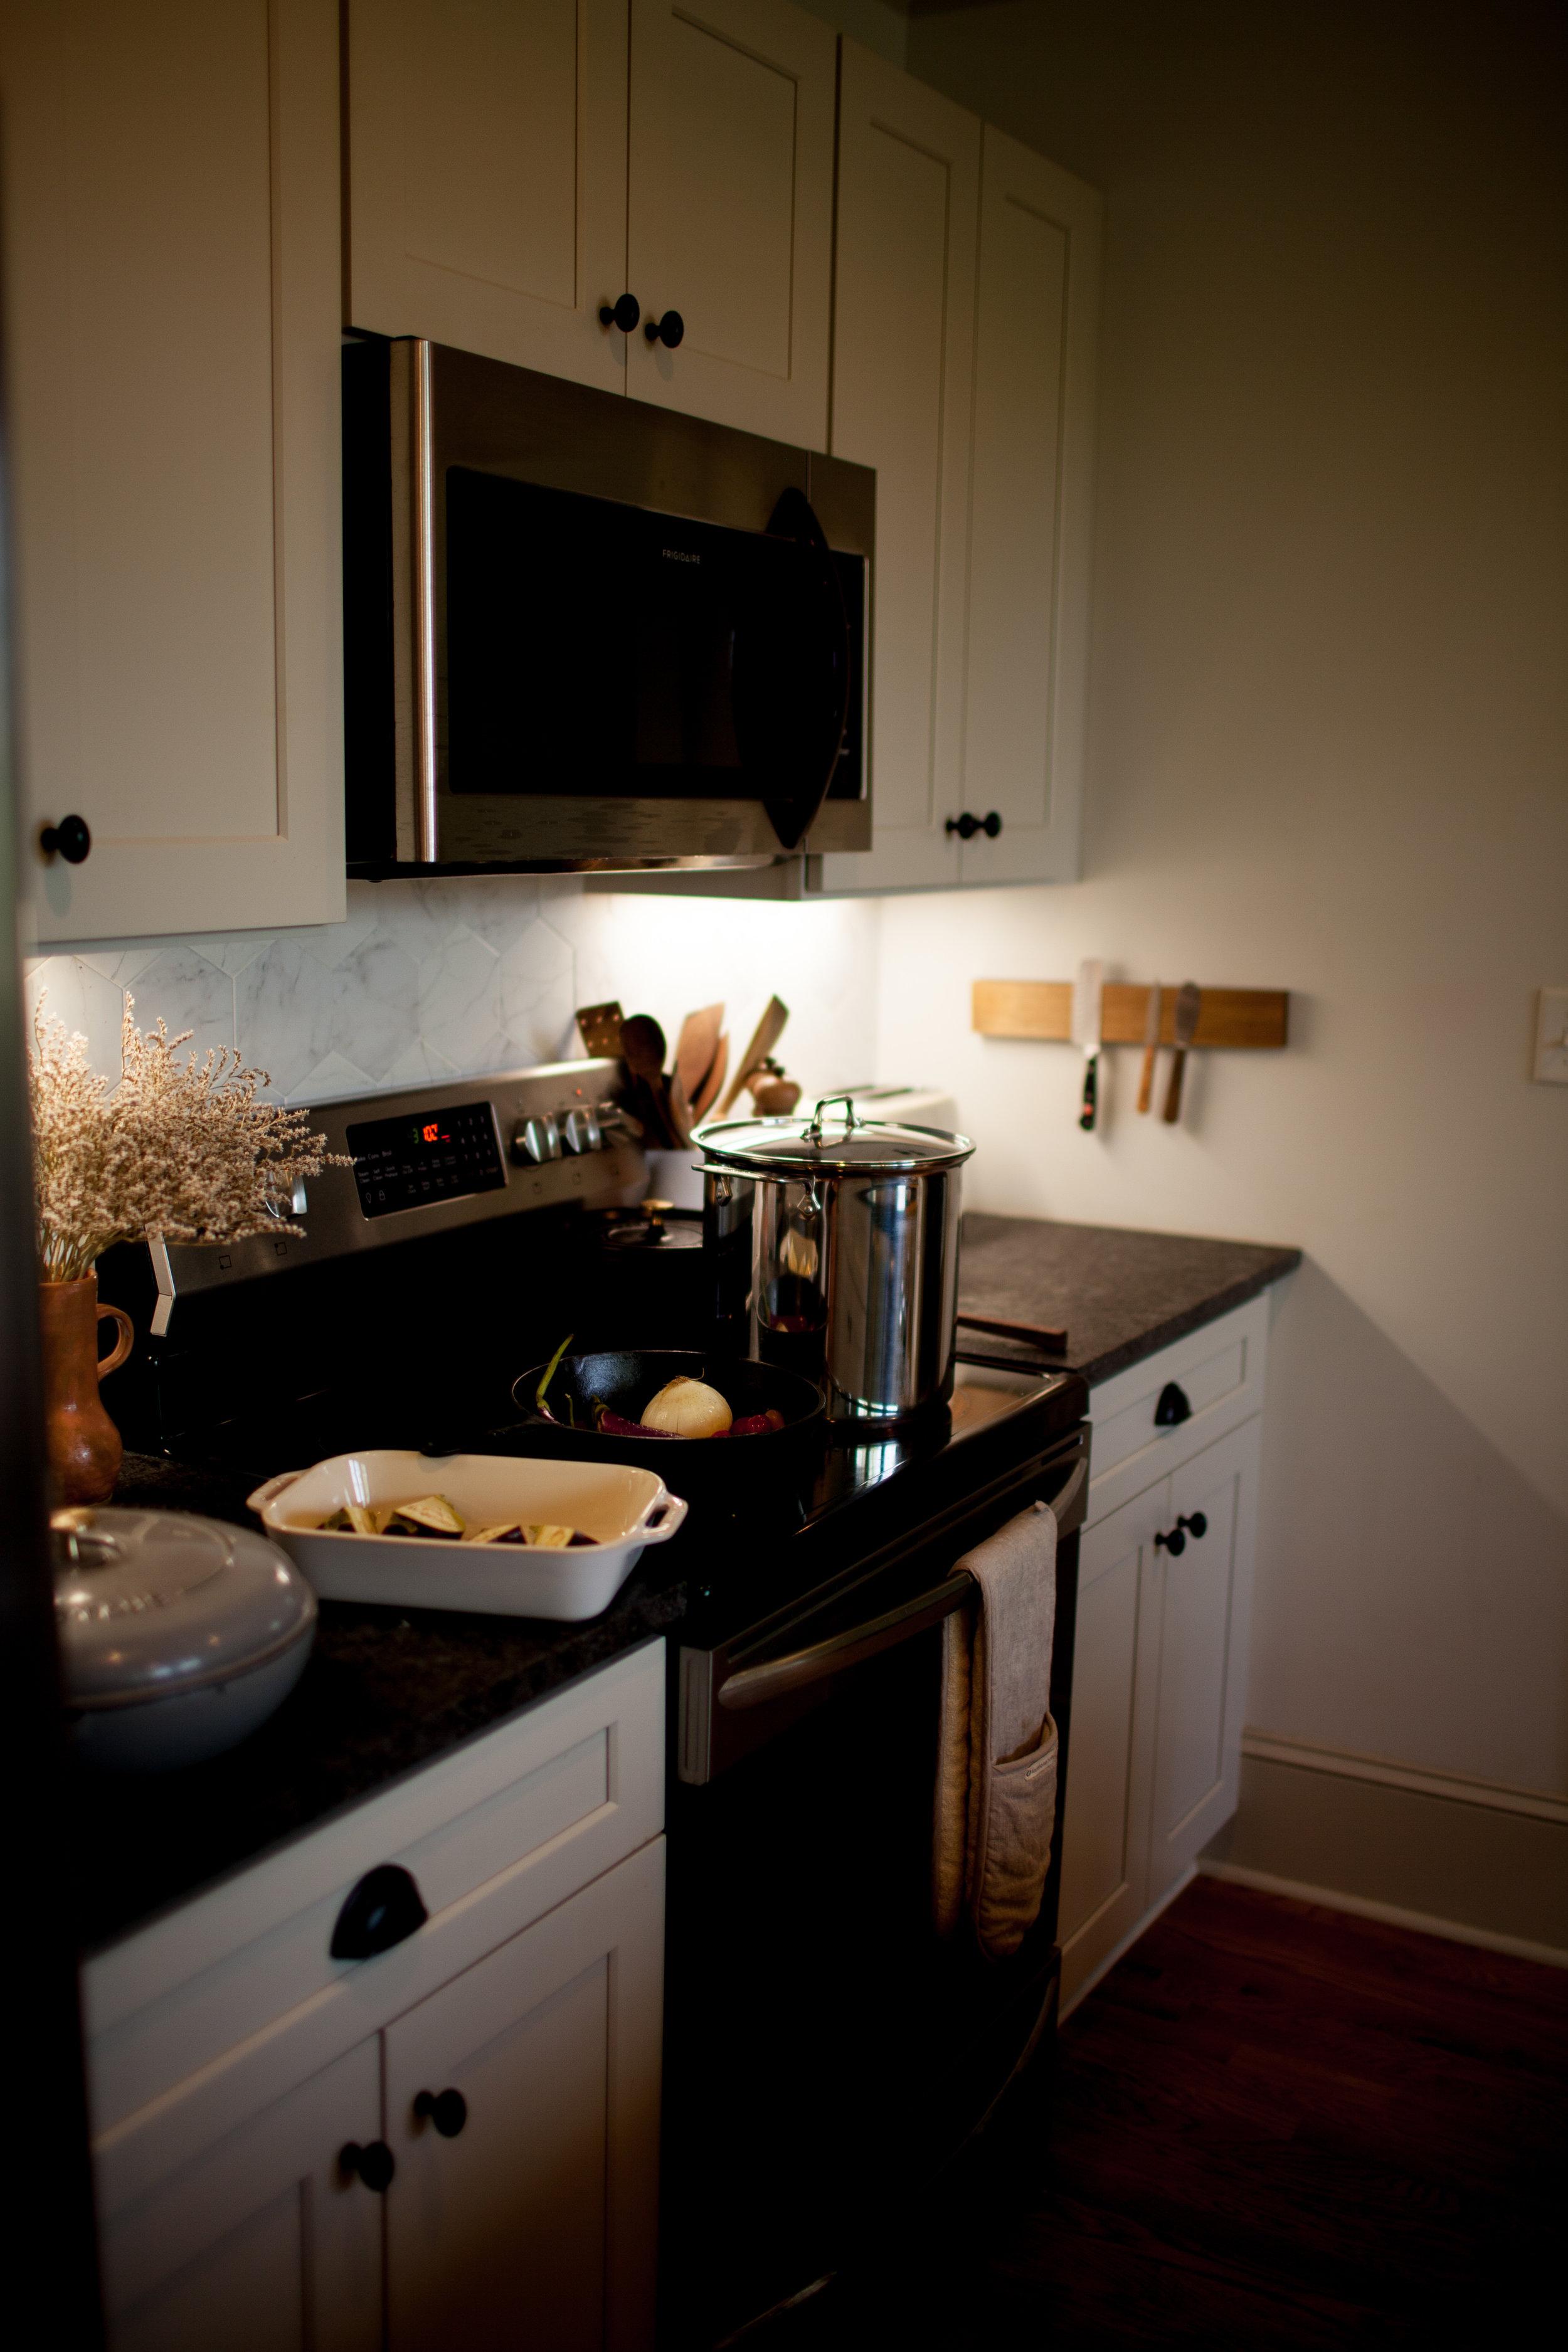 Artichokes-Kitchen_7-15-19-2.jpg